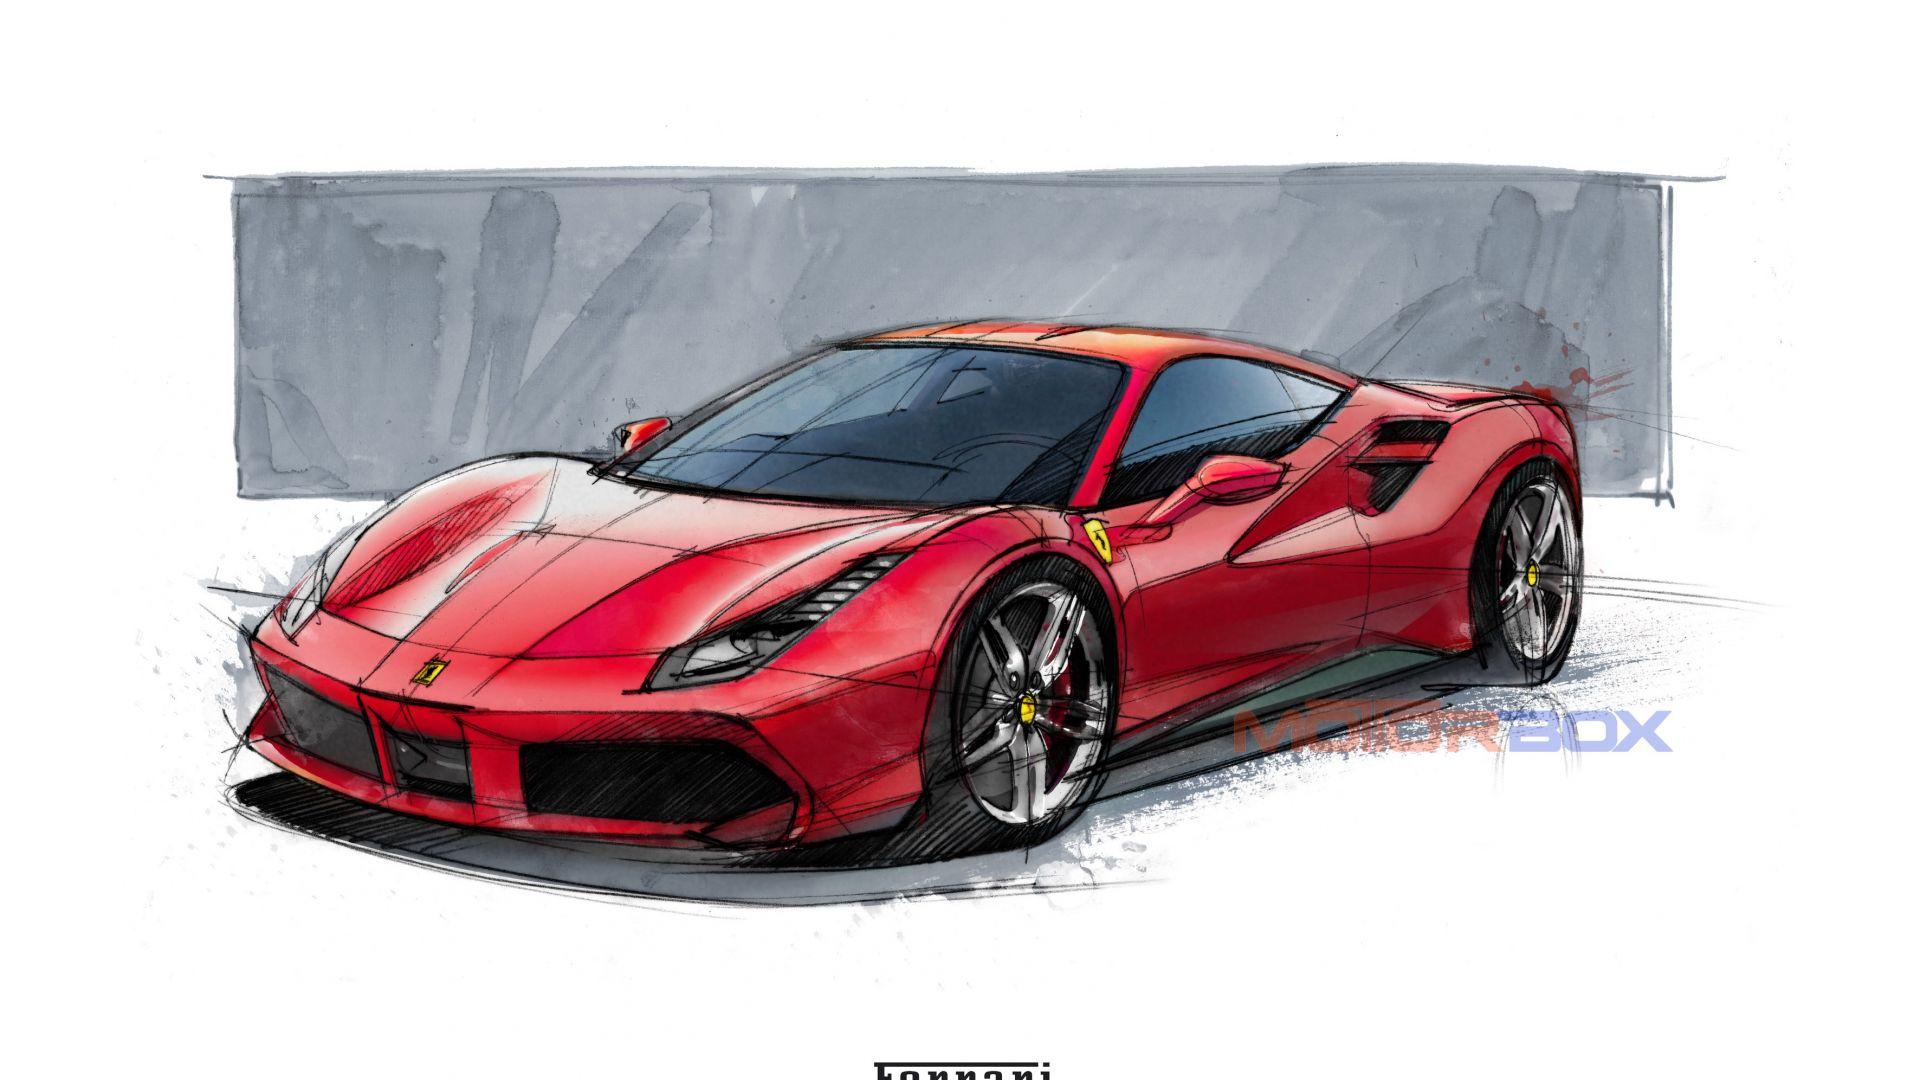 Ferrari La Ferrari >> Approfondimenti: Ferrari 488 GTB: focus sul design - MotorBox